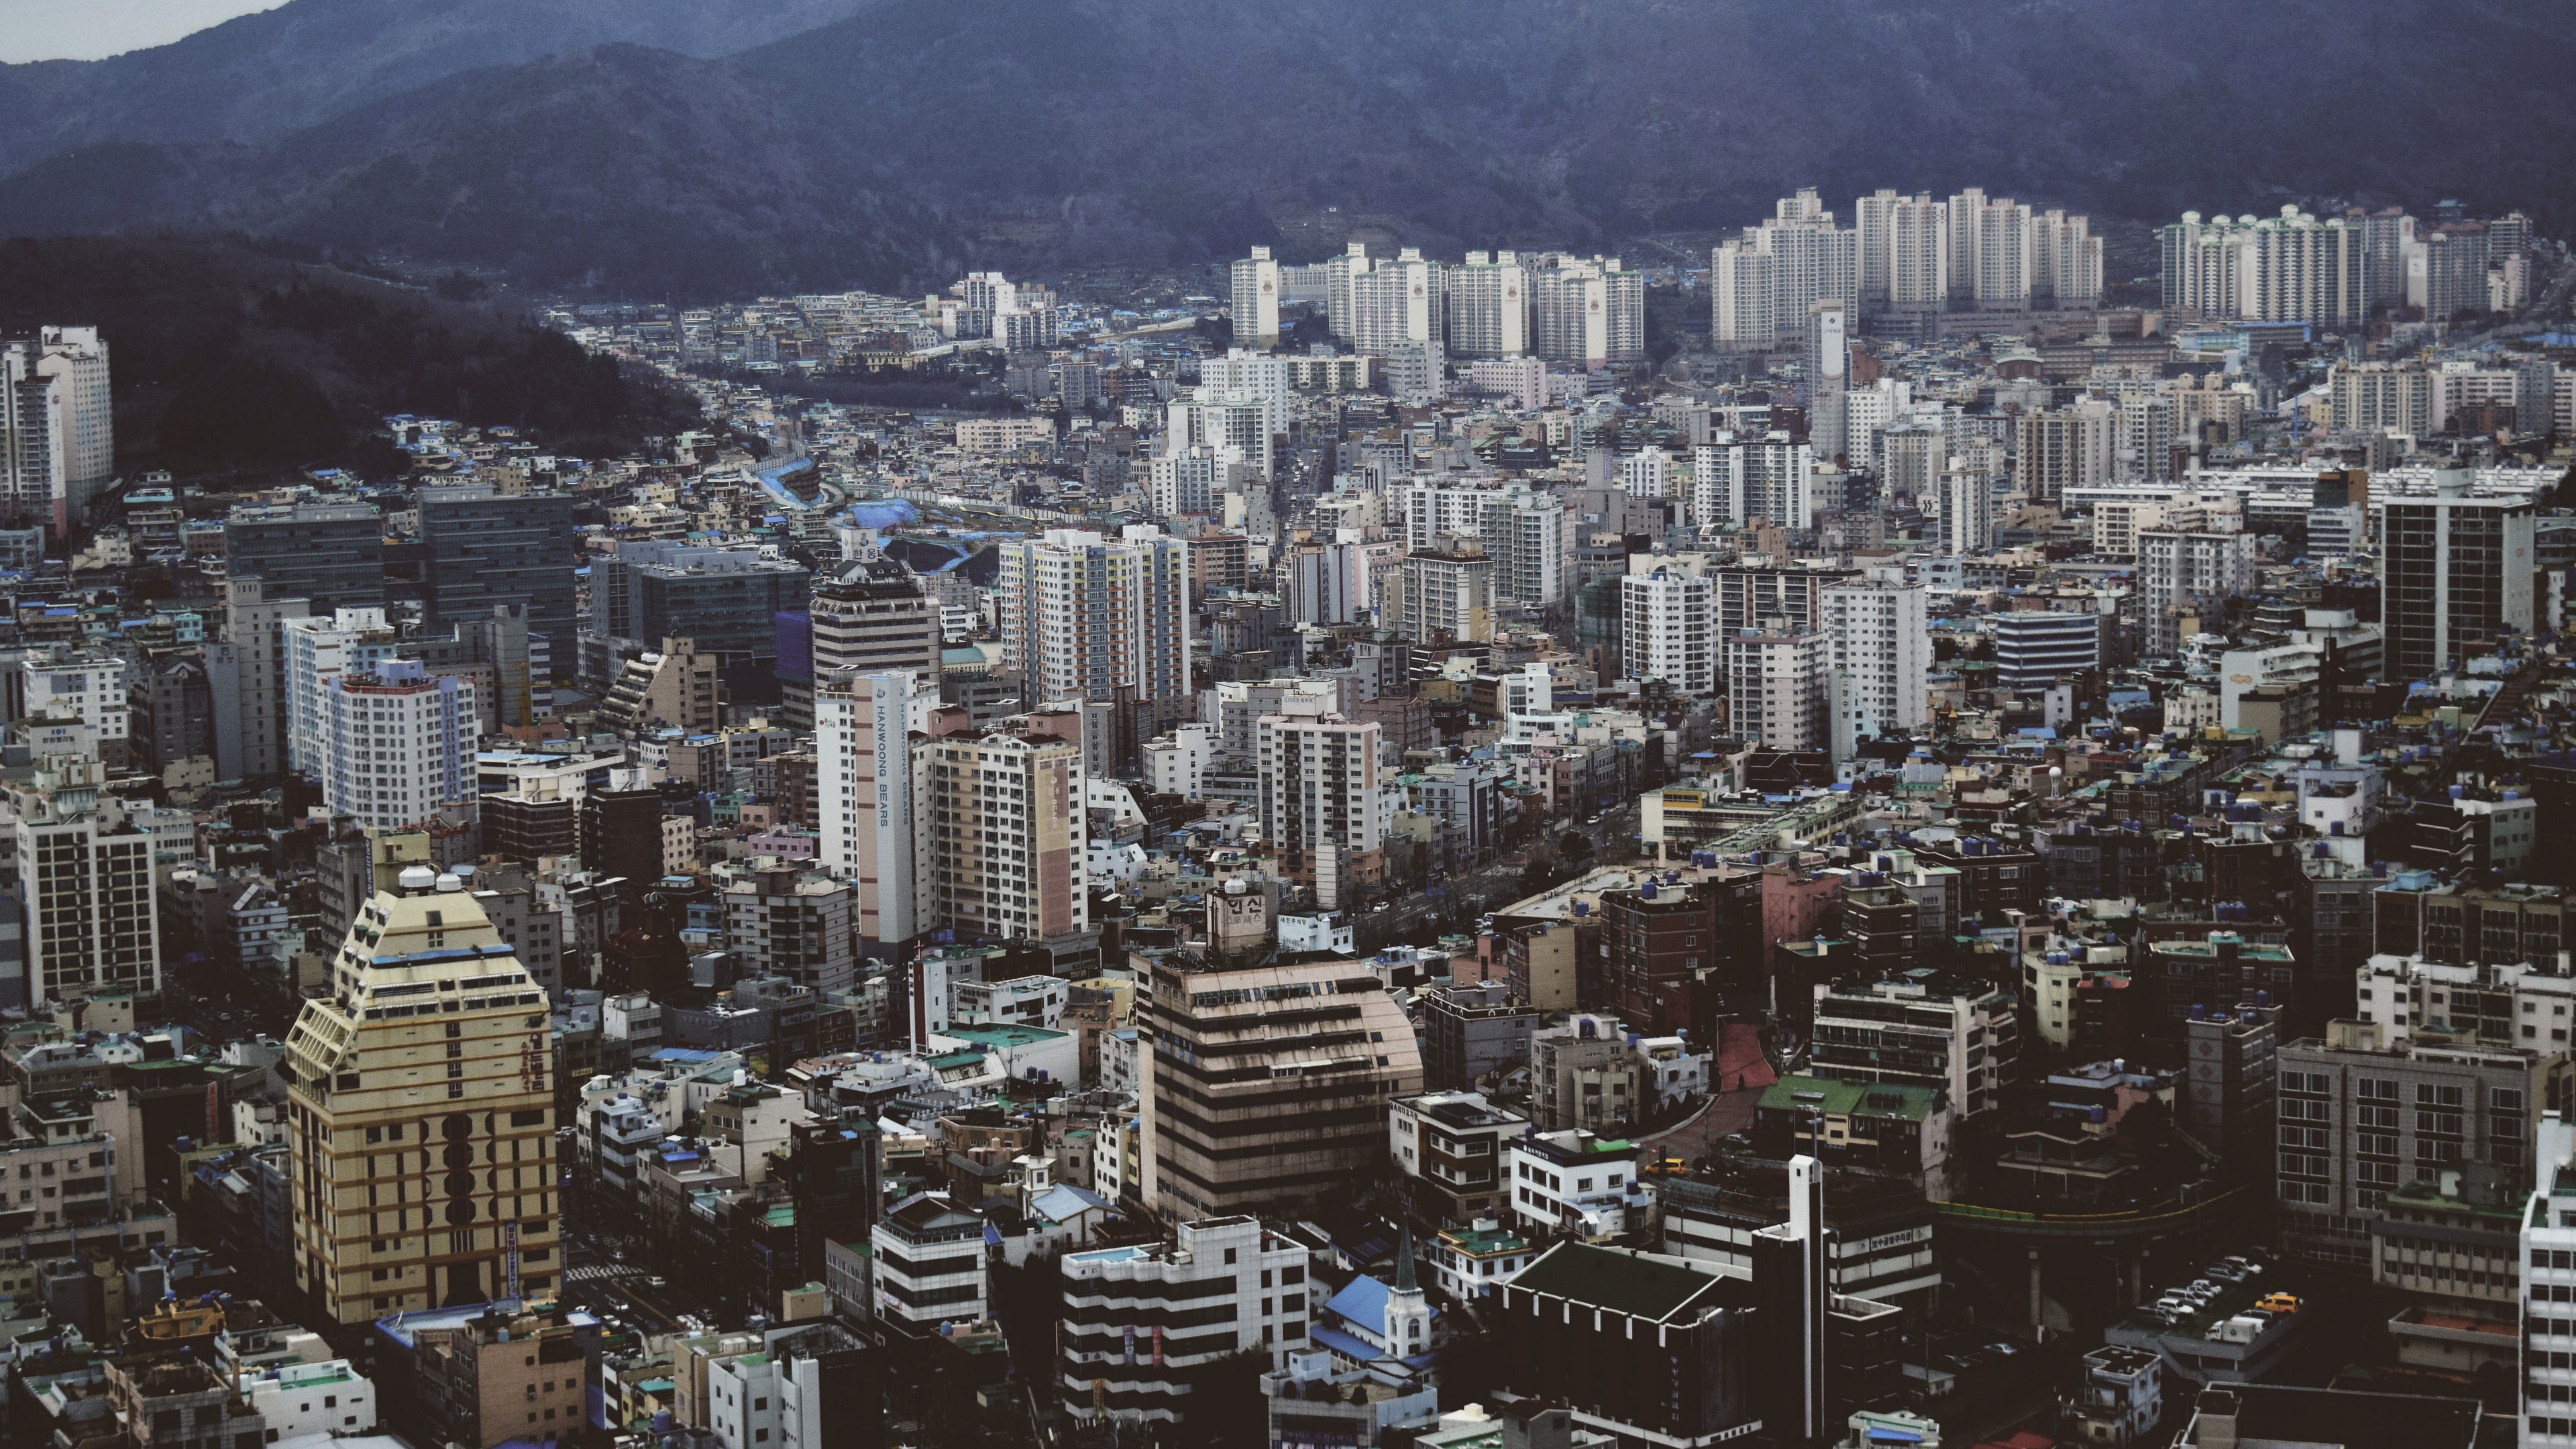 city buildings skyscrapers top view 4k 1538066849 - city, buildings, skyscrapers, top view 4k - Skyscrapers, City, buildings